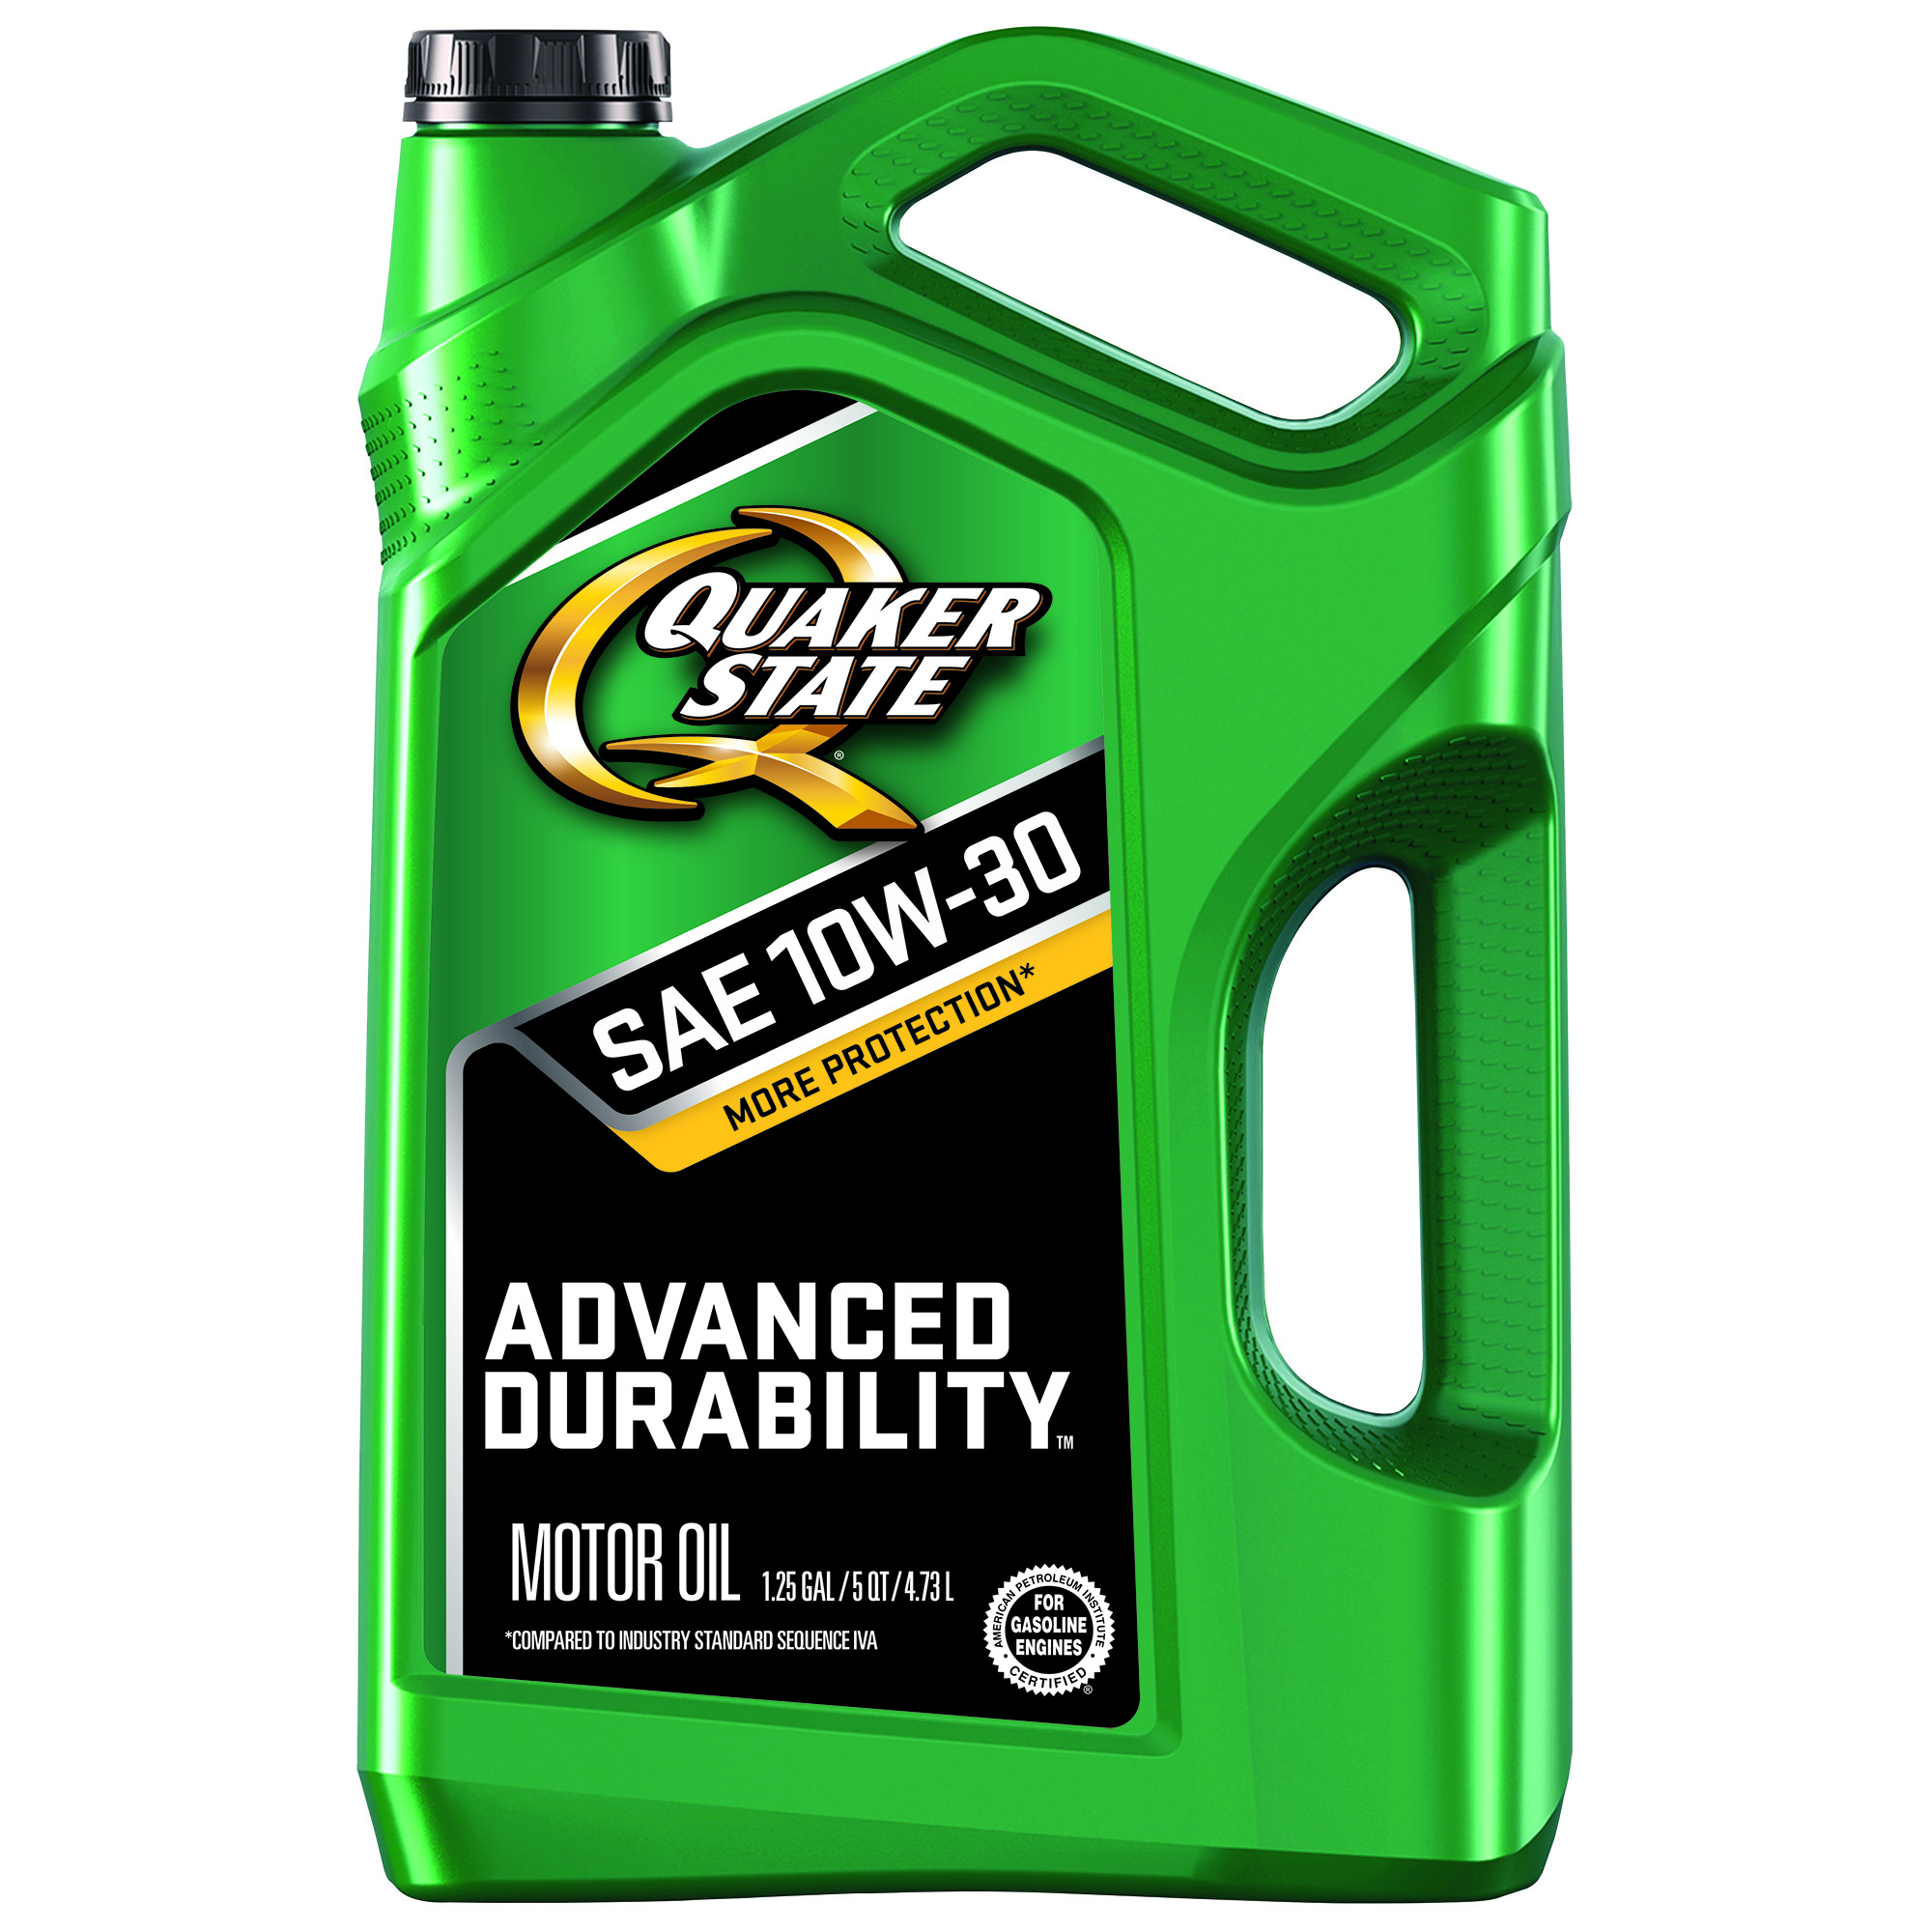 Quaker State Conventional 10W-30 Advanced Durability Motor Oil, 5 Quart